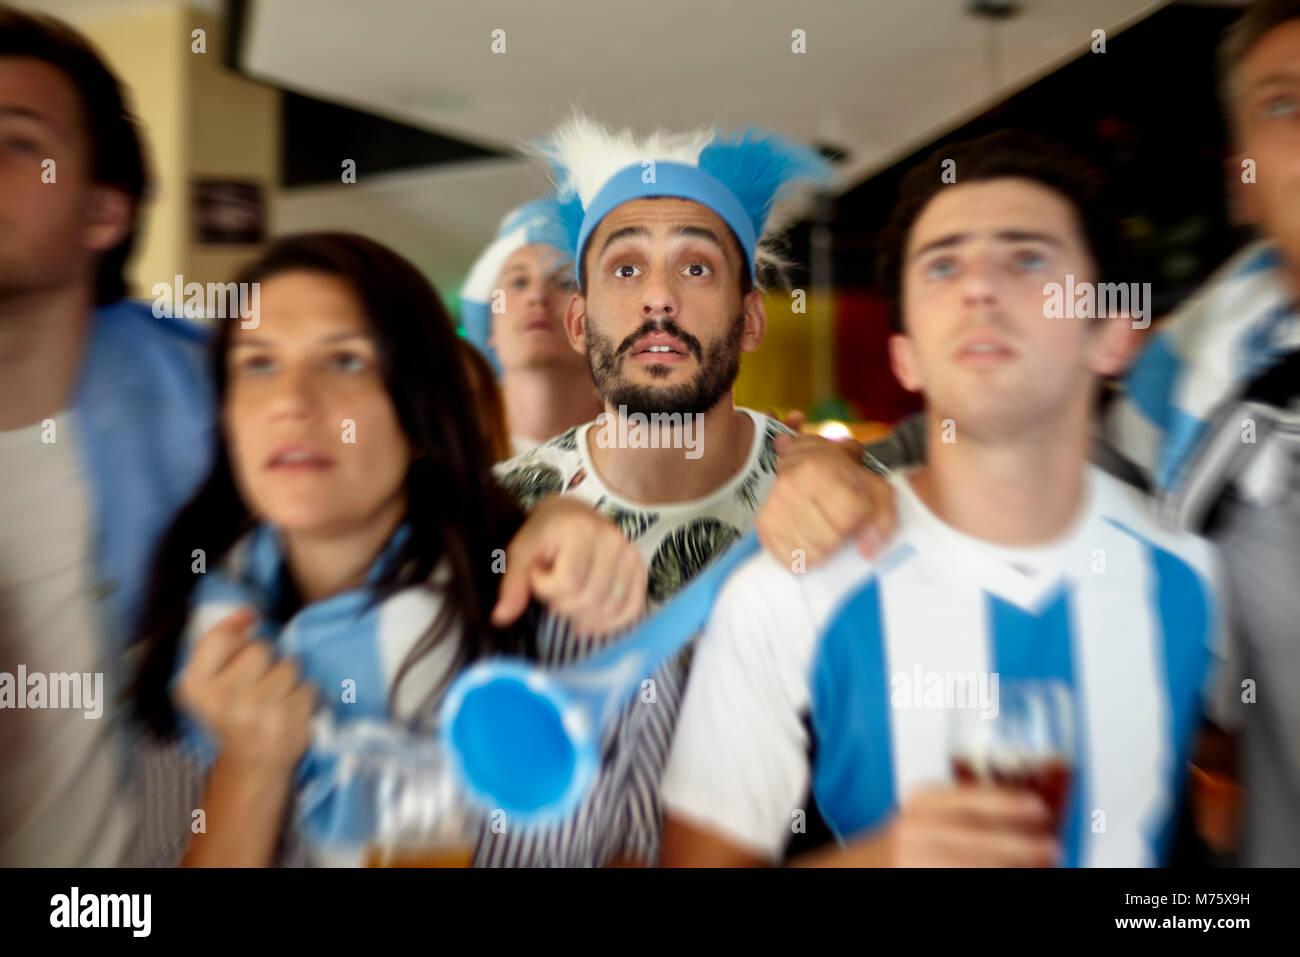 Argentinische Fußball-Anhänger gespannt beobachten Match in bar Stockbild